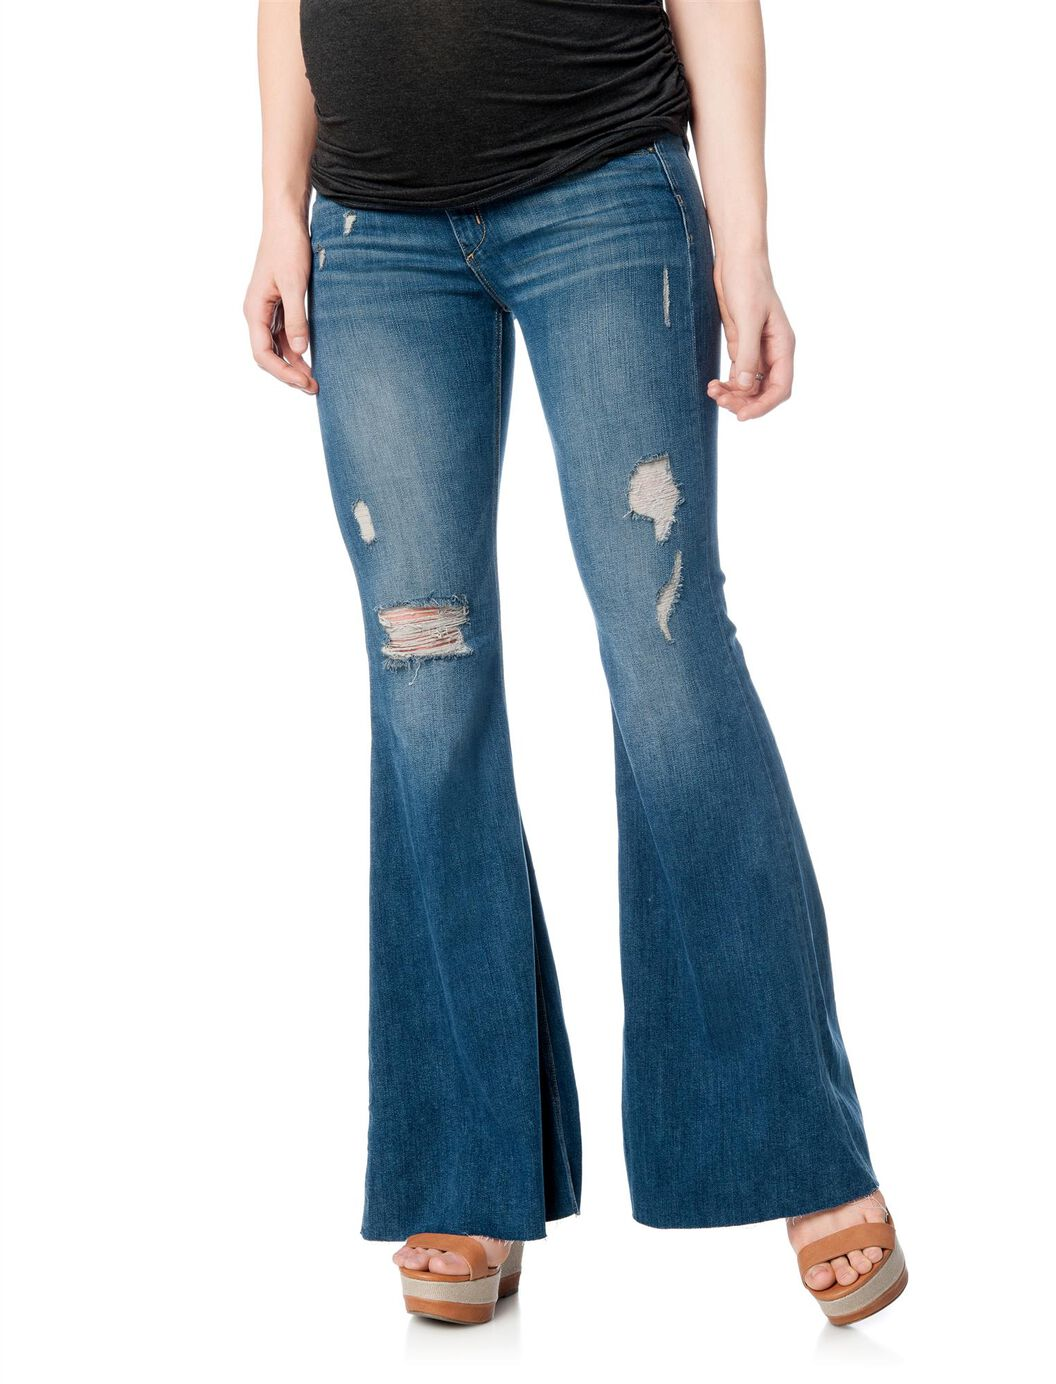 Mcguire Secret Fit Belly Skinny Flare Maternity Jeans, Oceana Medium Wash - Mcguire Secret Fit Belly Skinny Flare Maternity Jeans